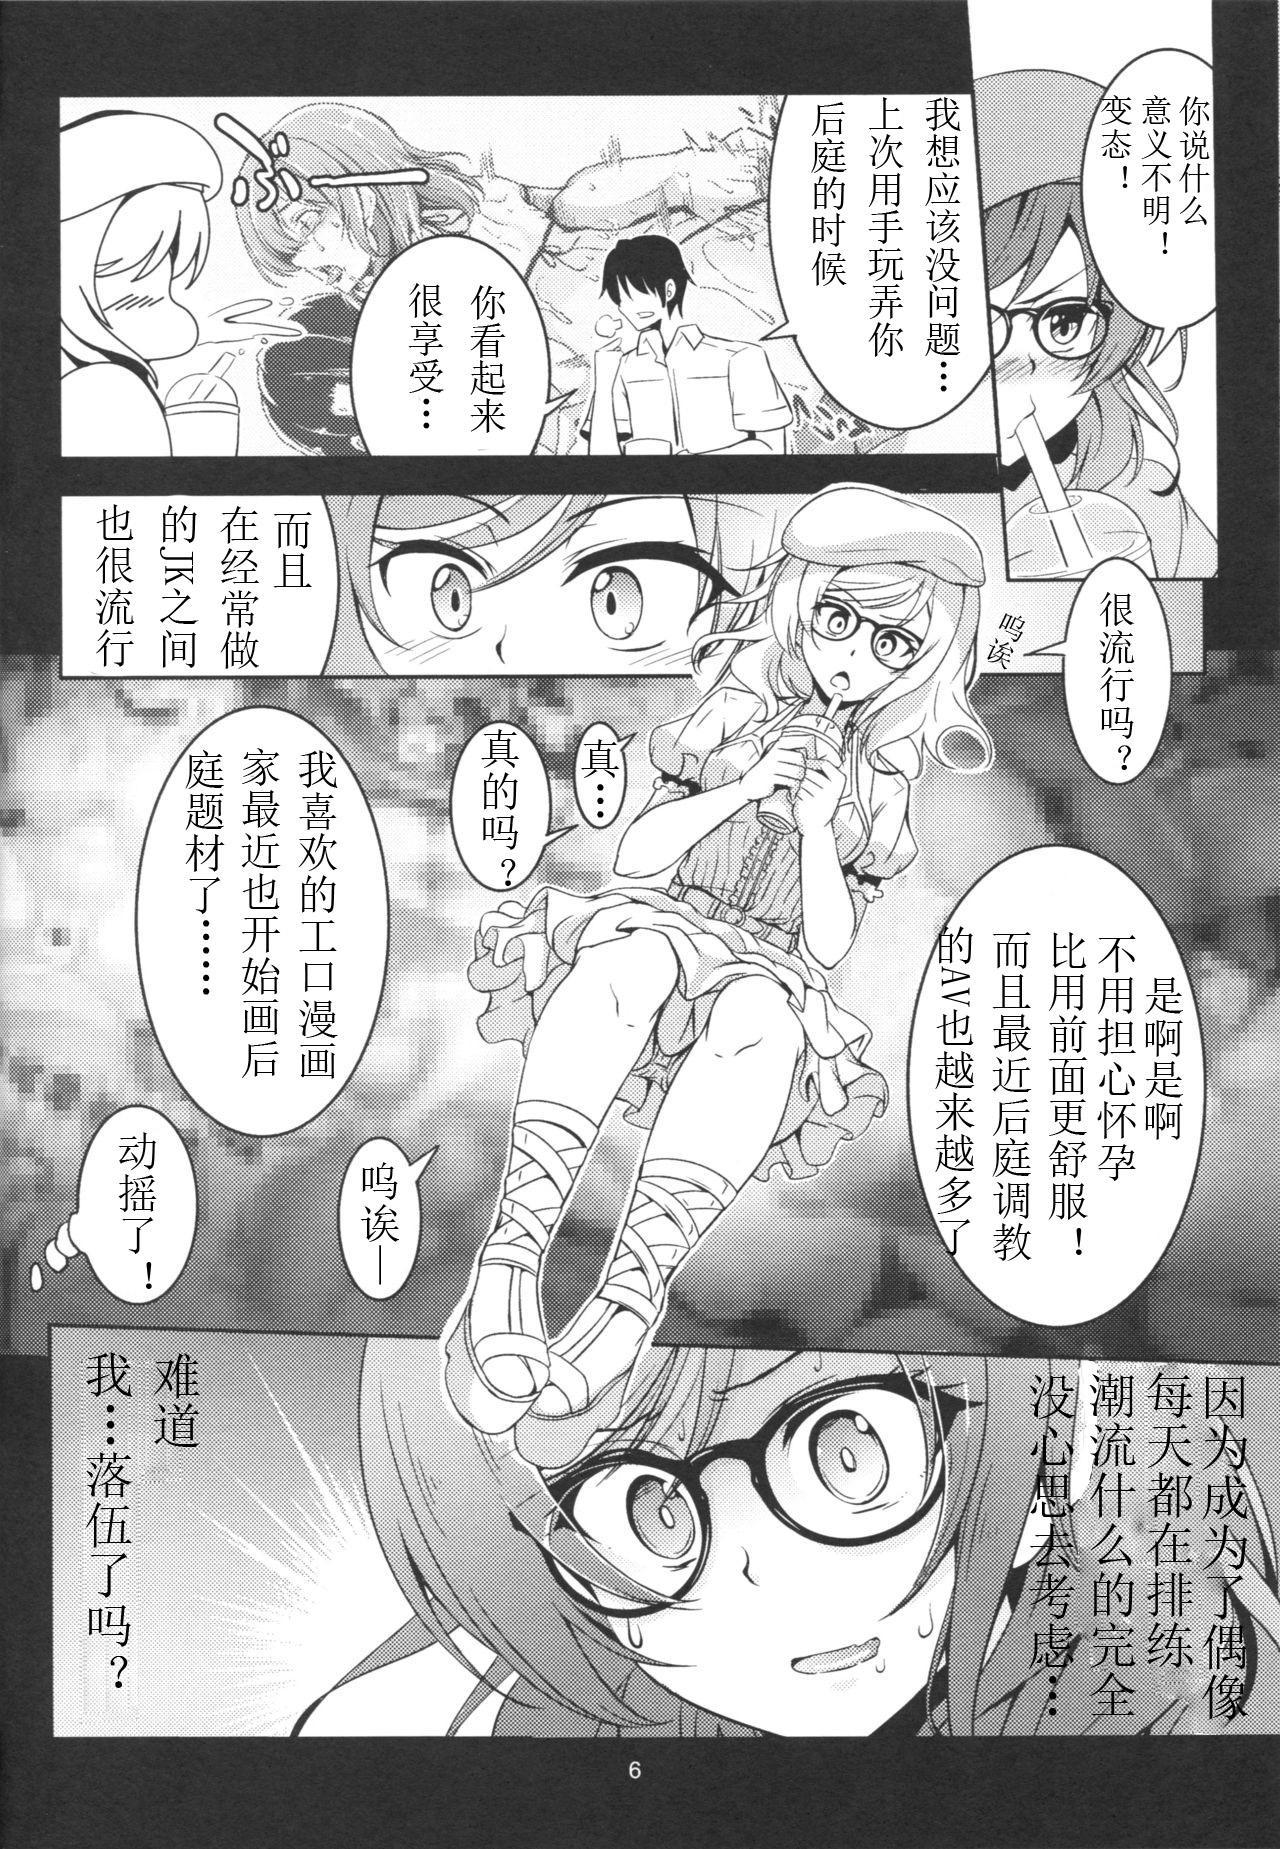 Hime Shiri -Maki Hip!! Koi Hime Love Maki! 2.0 6